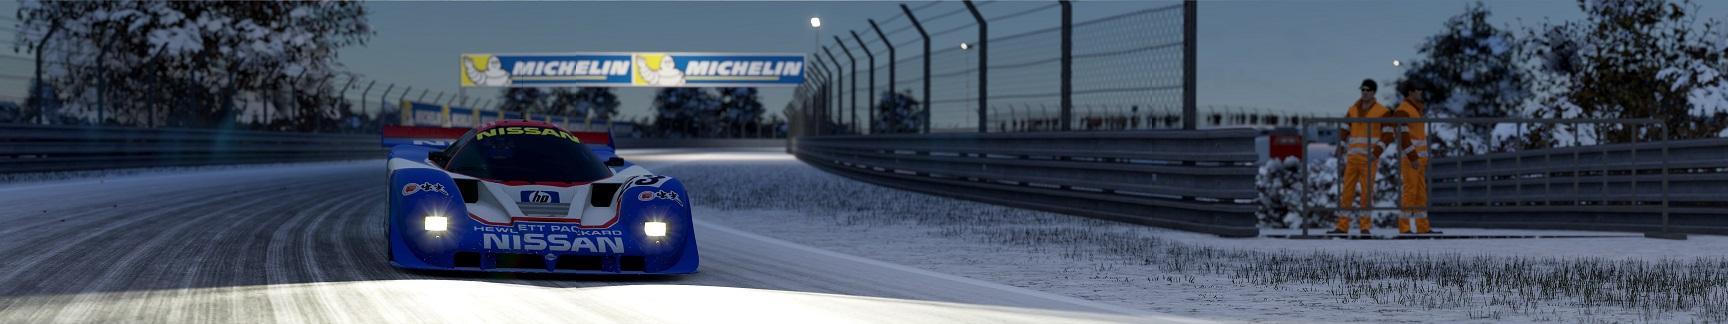 NISSAN at LeMANS in SNOW 6 copy.jpg